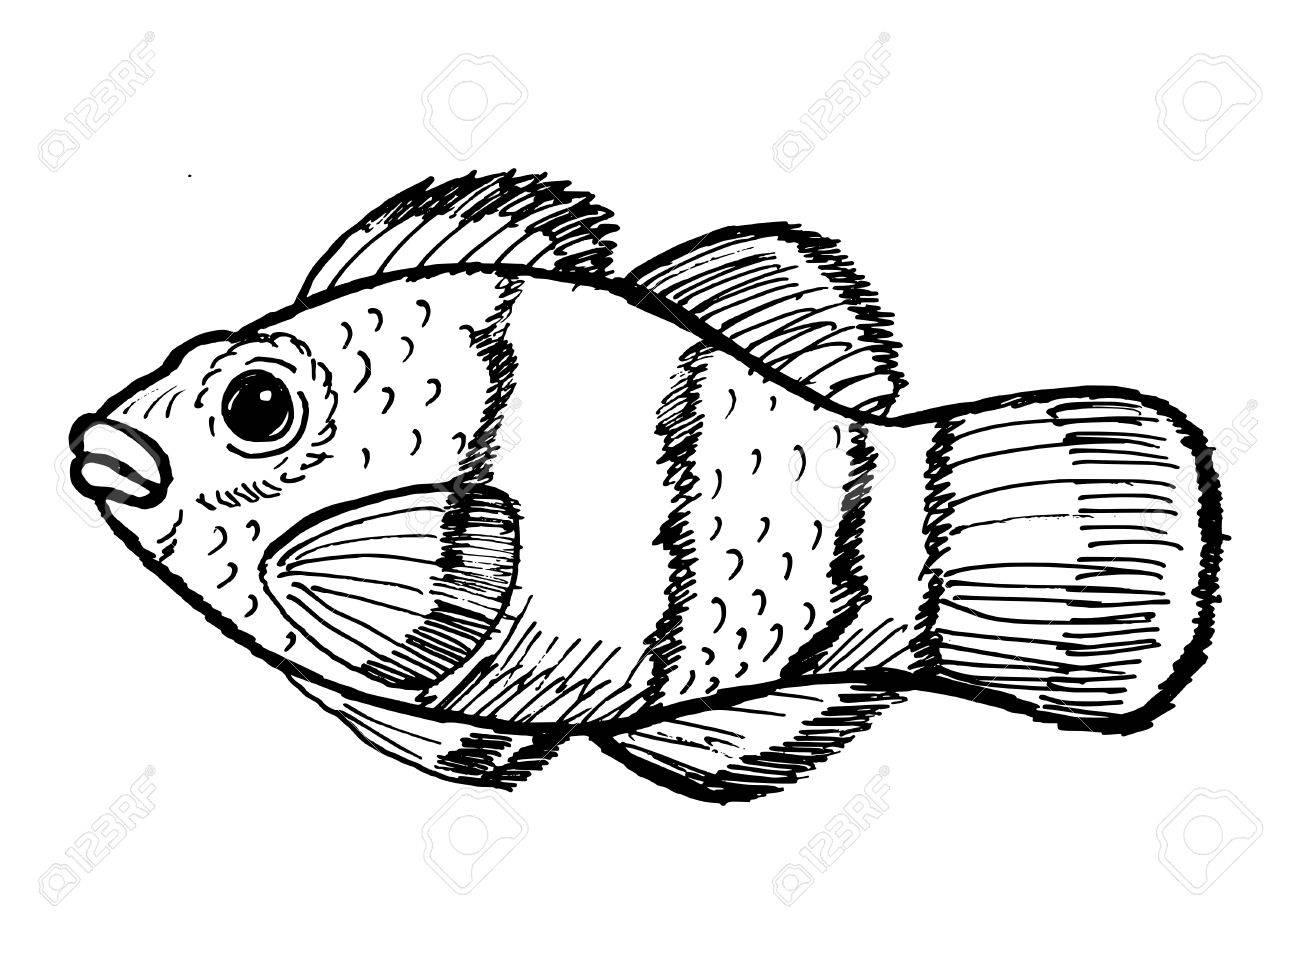 Hand Drawn Sketch Cartoon Illustration Of Clown Fish Royalty Free